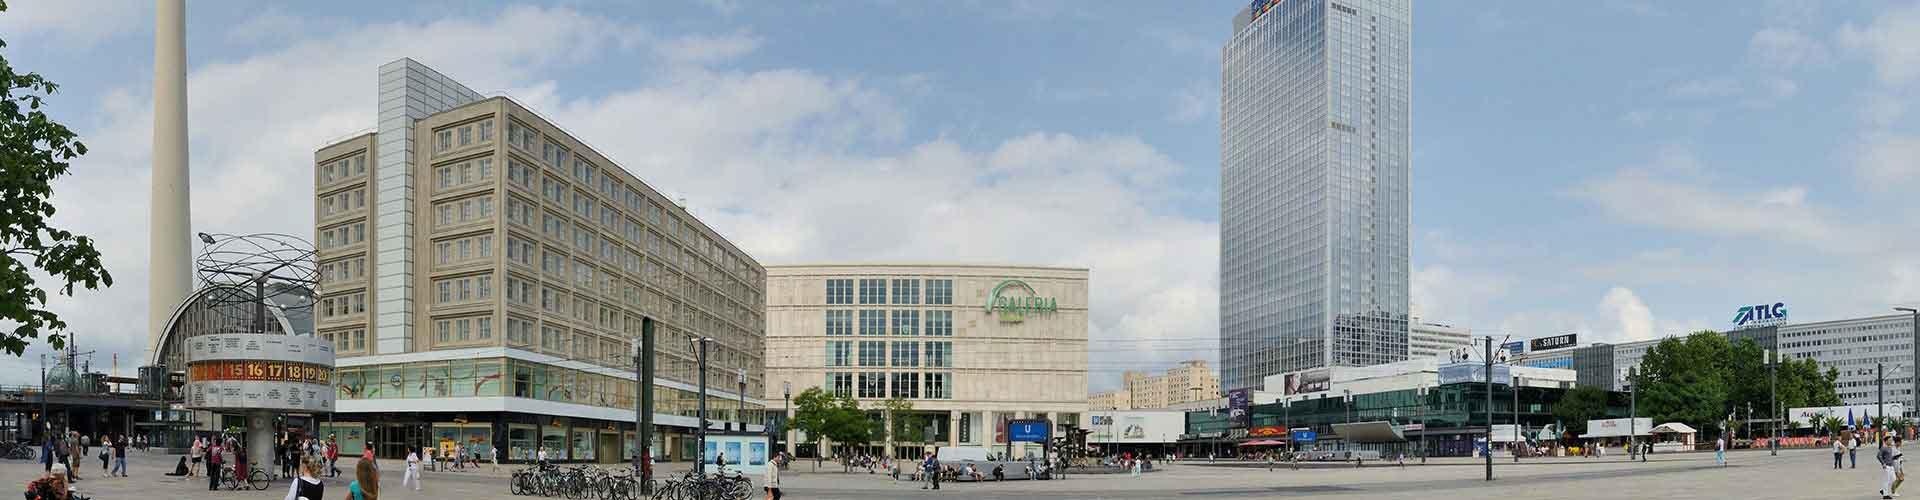 Berlín - Campamentos cerca a Alexanderplatz. Mapas de Berlín, Fotos y comentarios de cada Campamento en Berlín.